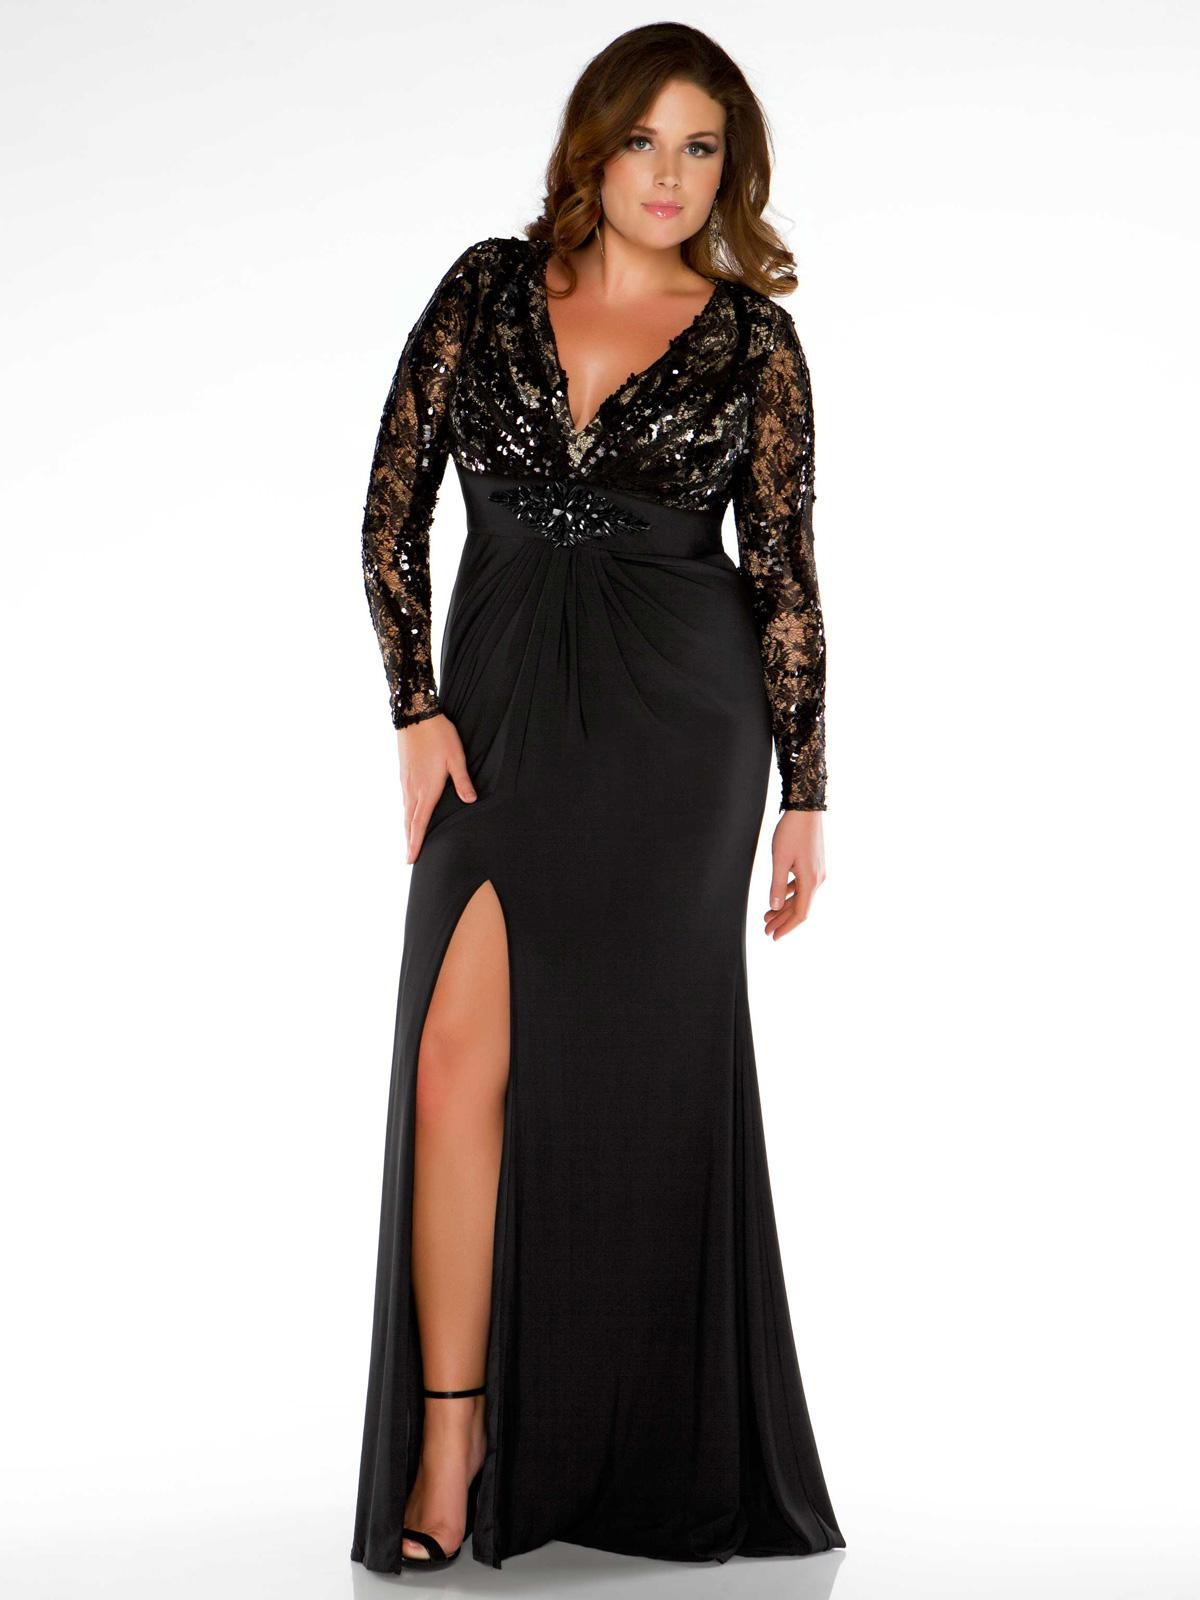 Black Long Sleeve Sheath Plus Size Prom Dress V-neck Lace ...